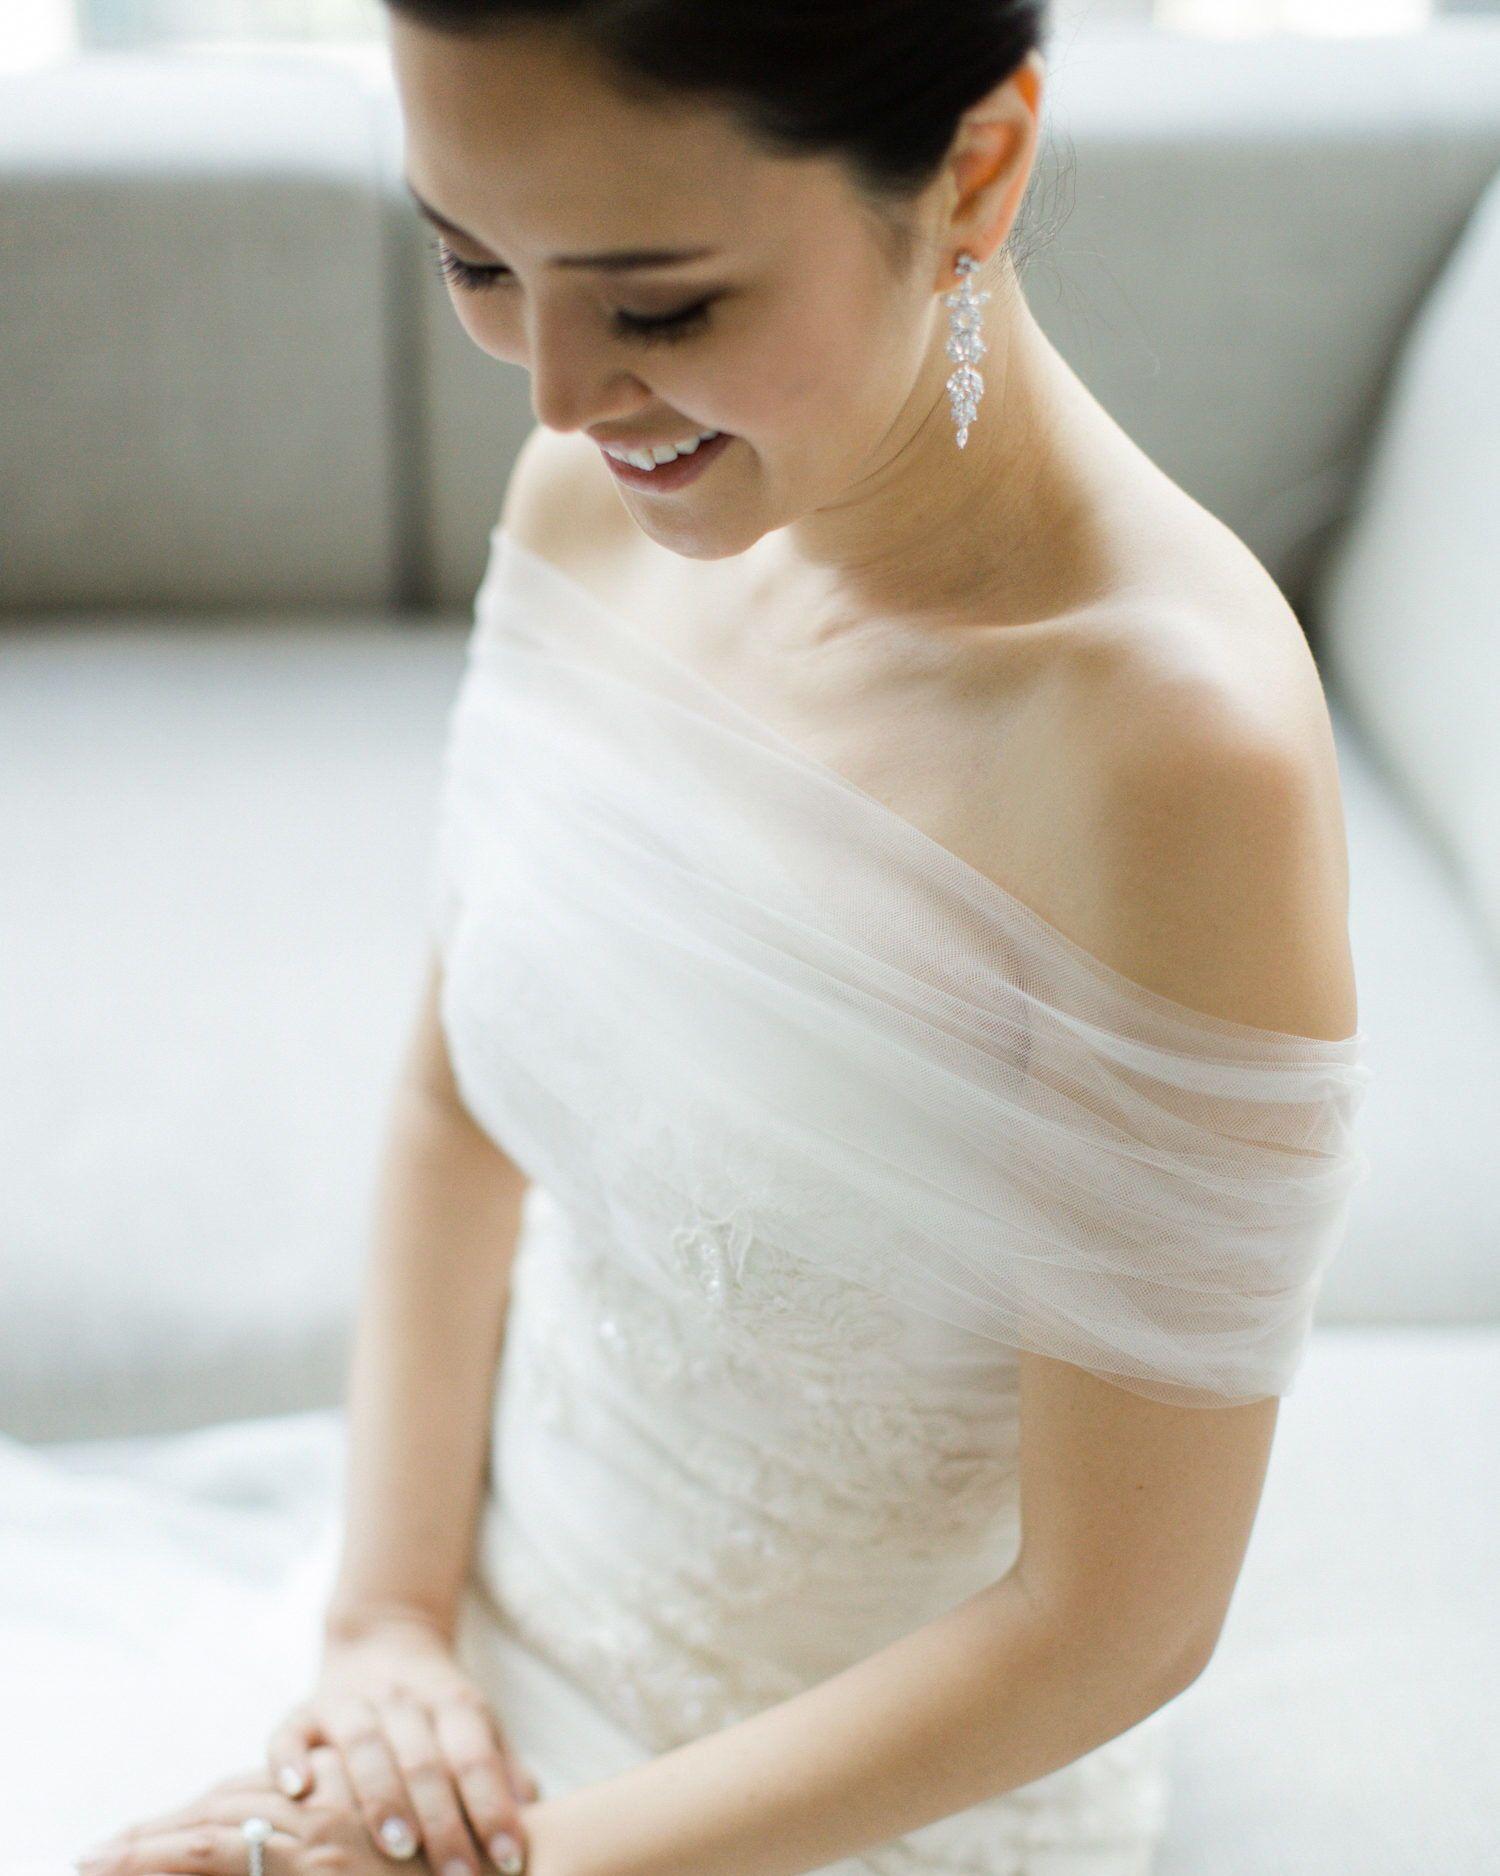 Bridal Jewelry For Every Wedding Dress